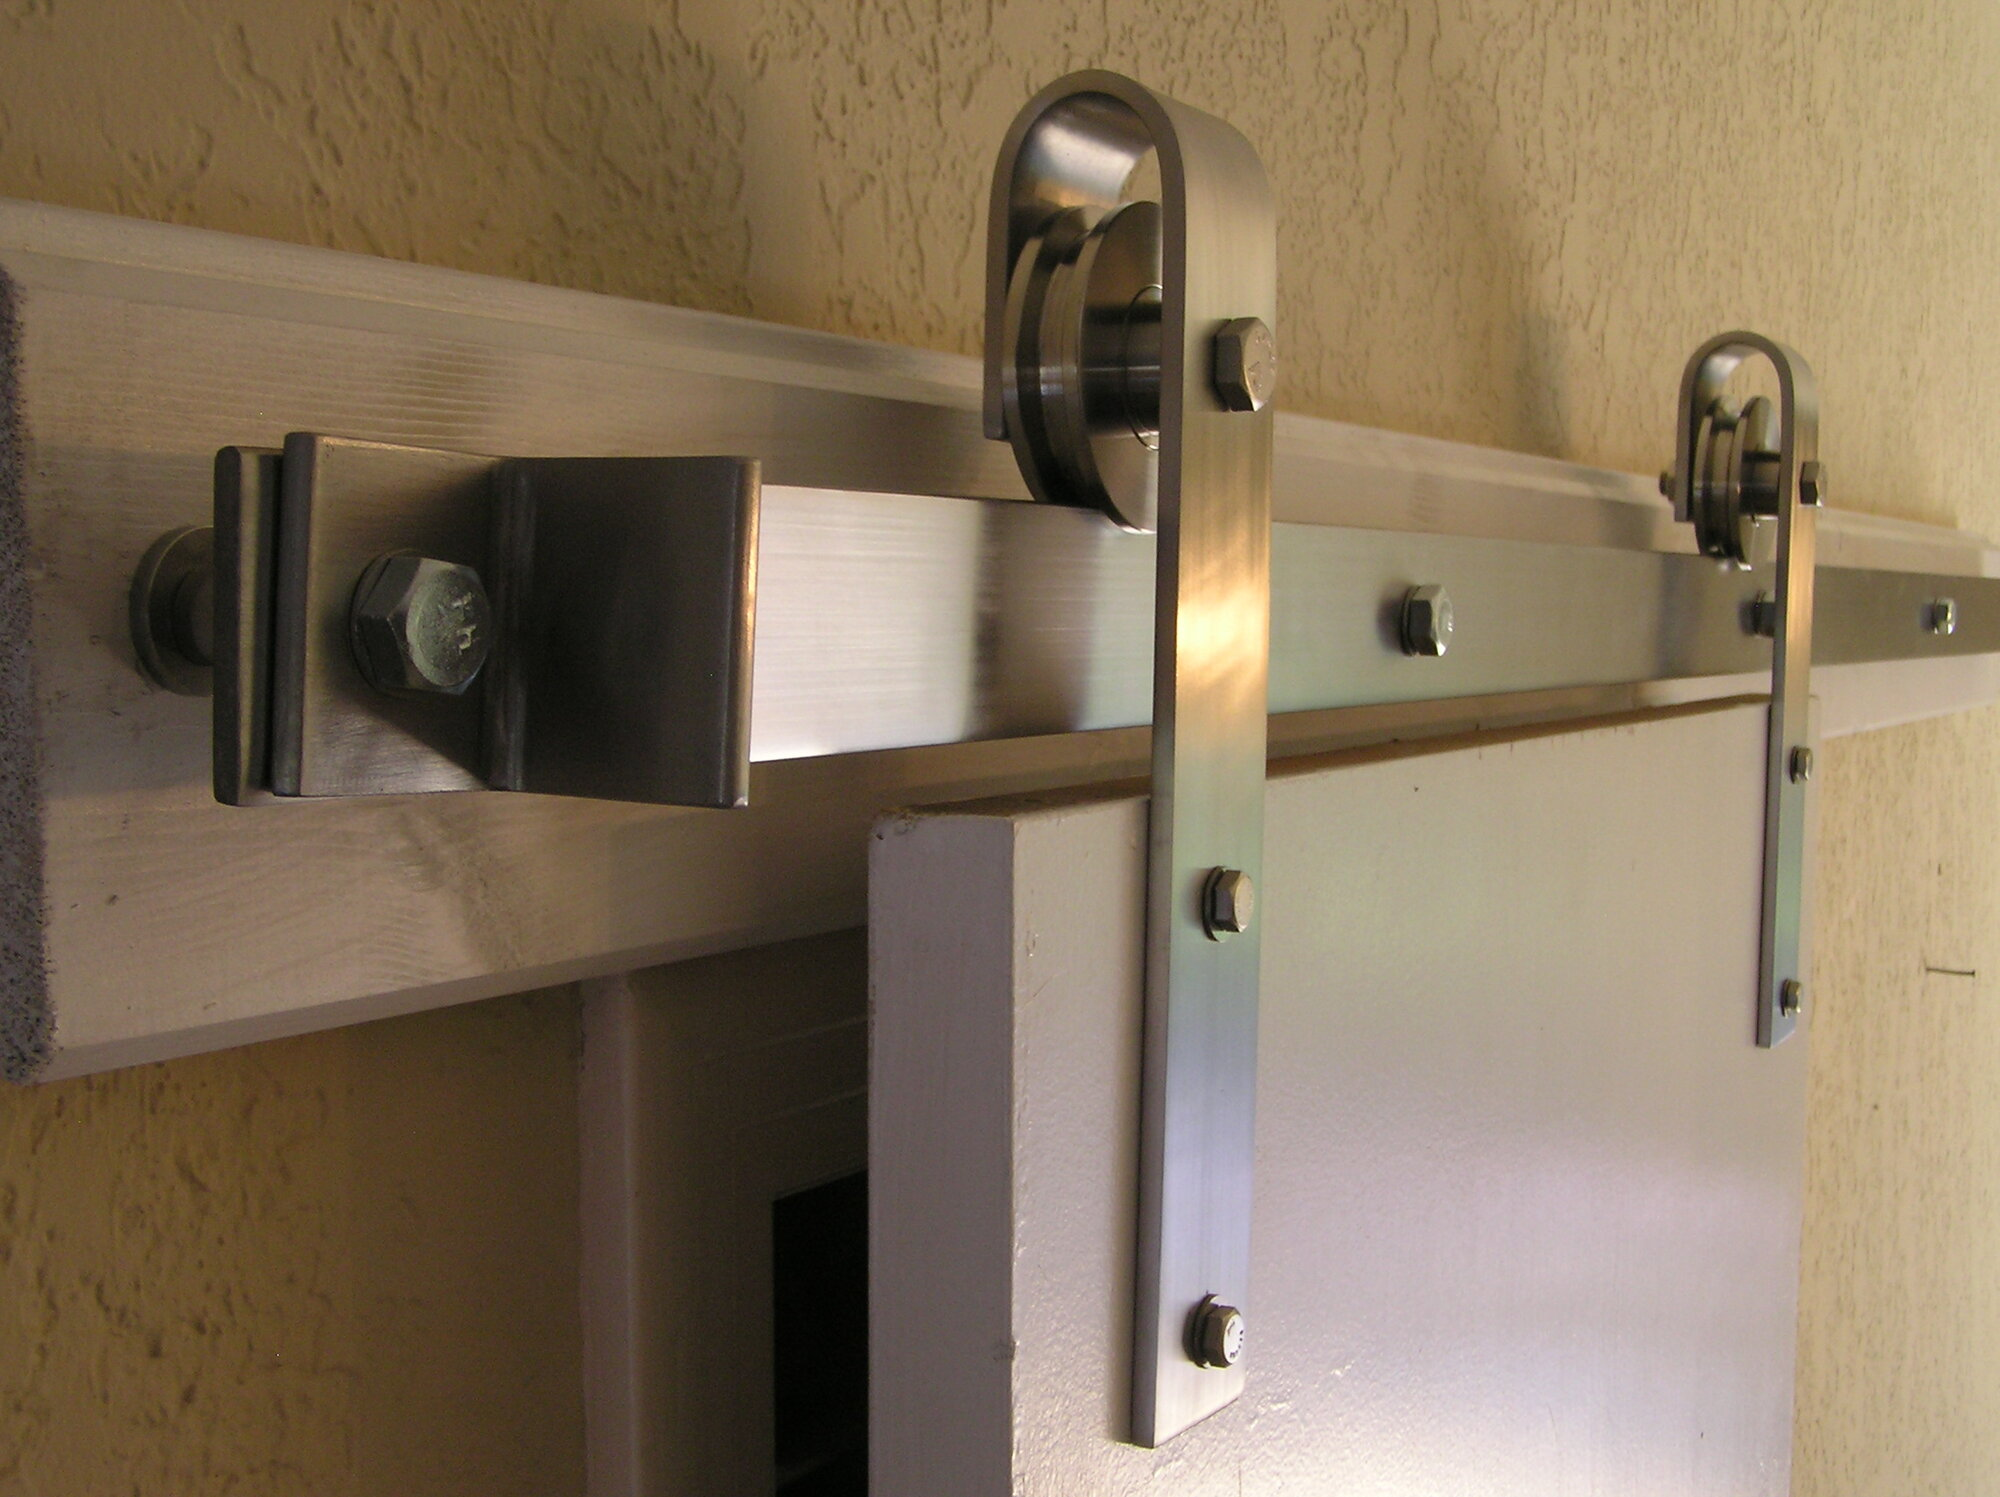 Agave ironworks barn door rolling hardware kit agir1076 ebay for Rolling barn door hardware